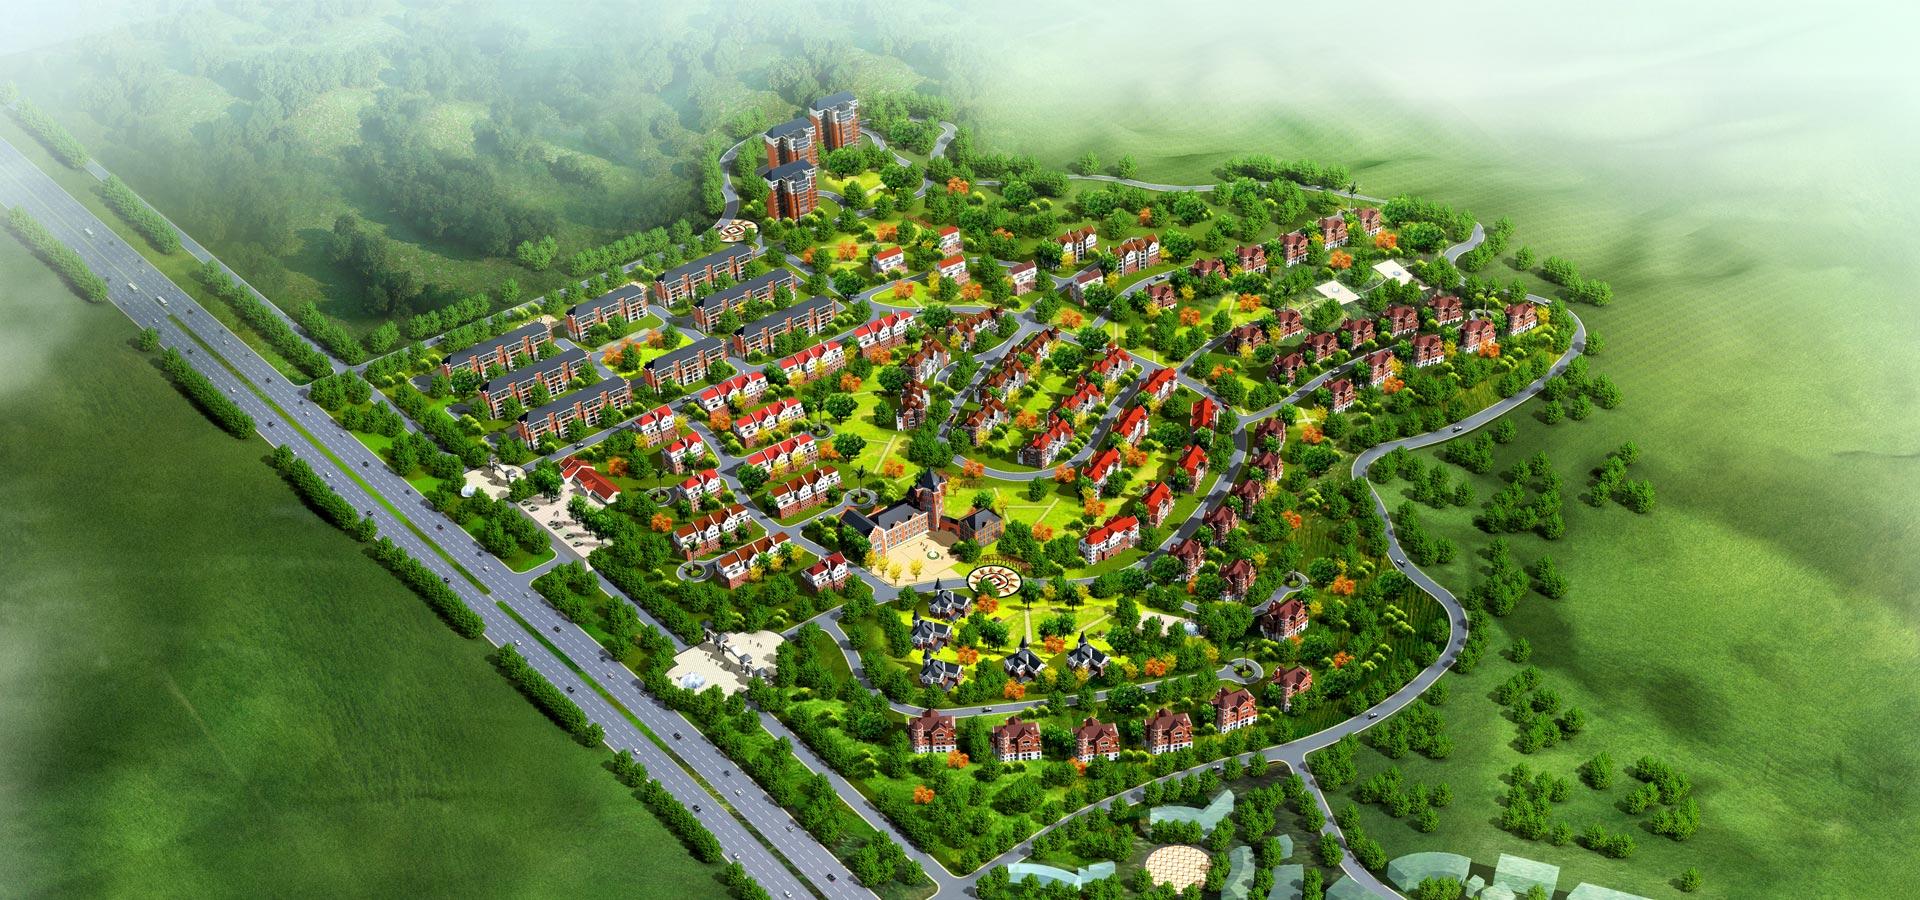 Design Residential Complex Baicaopo